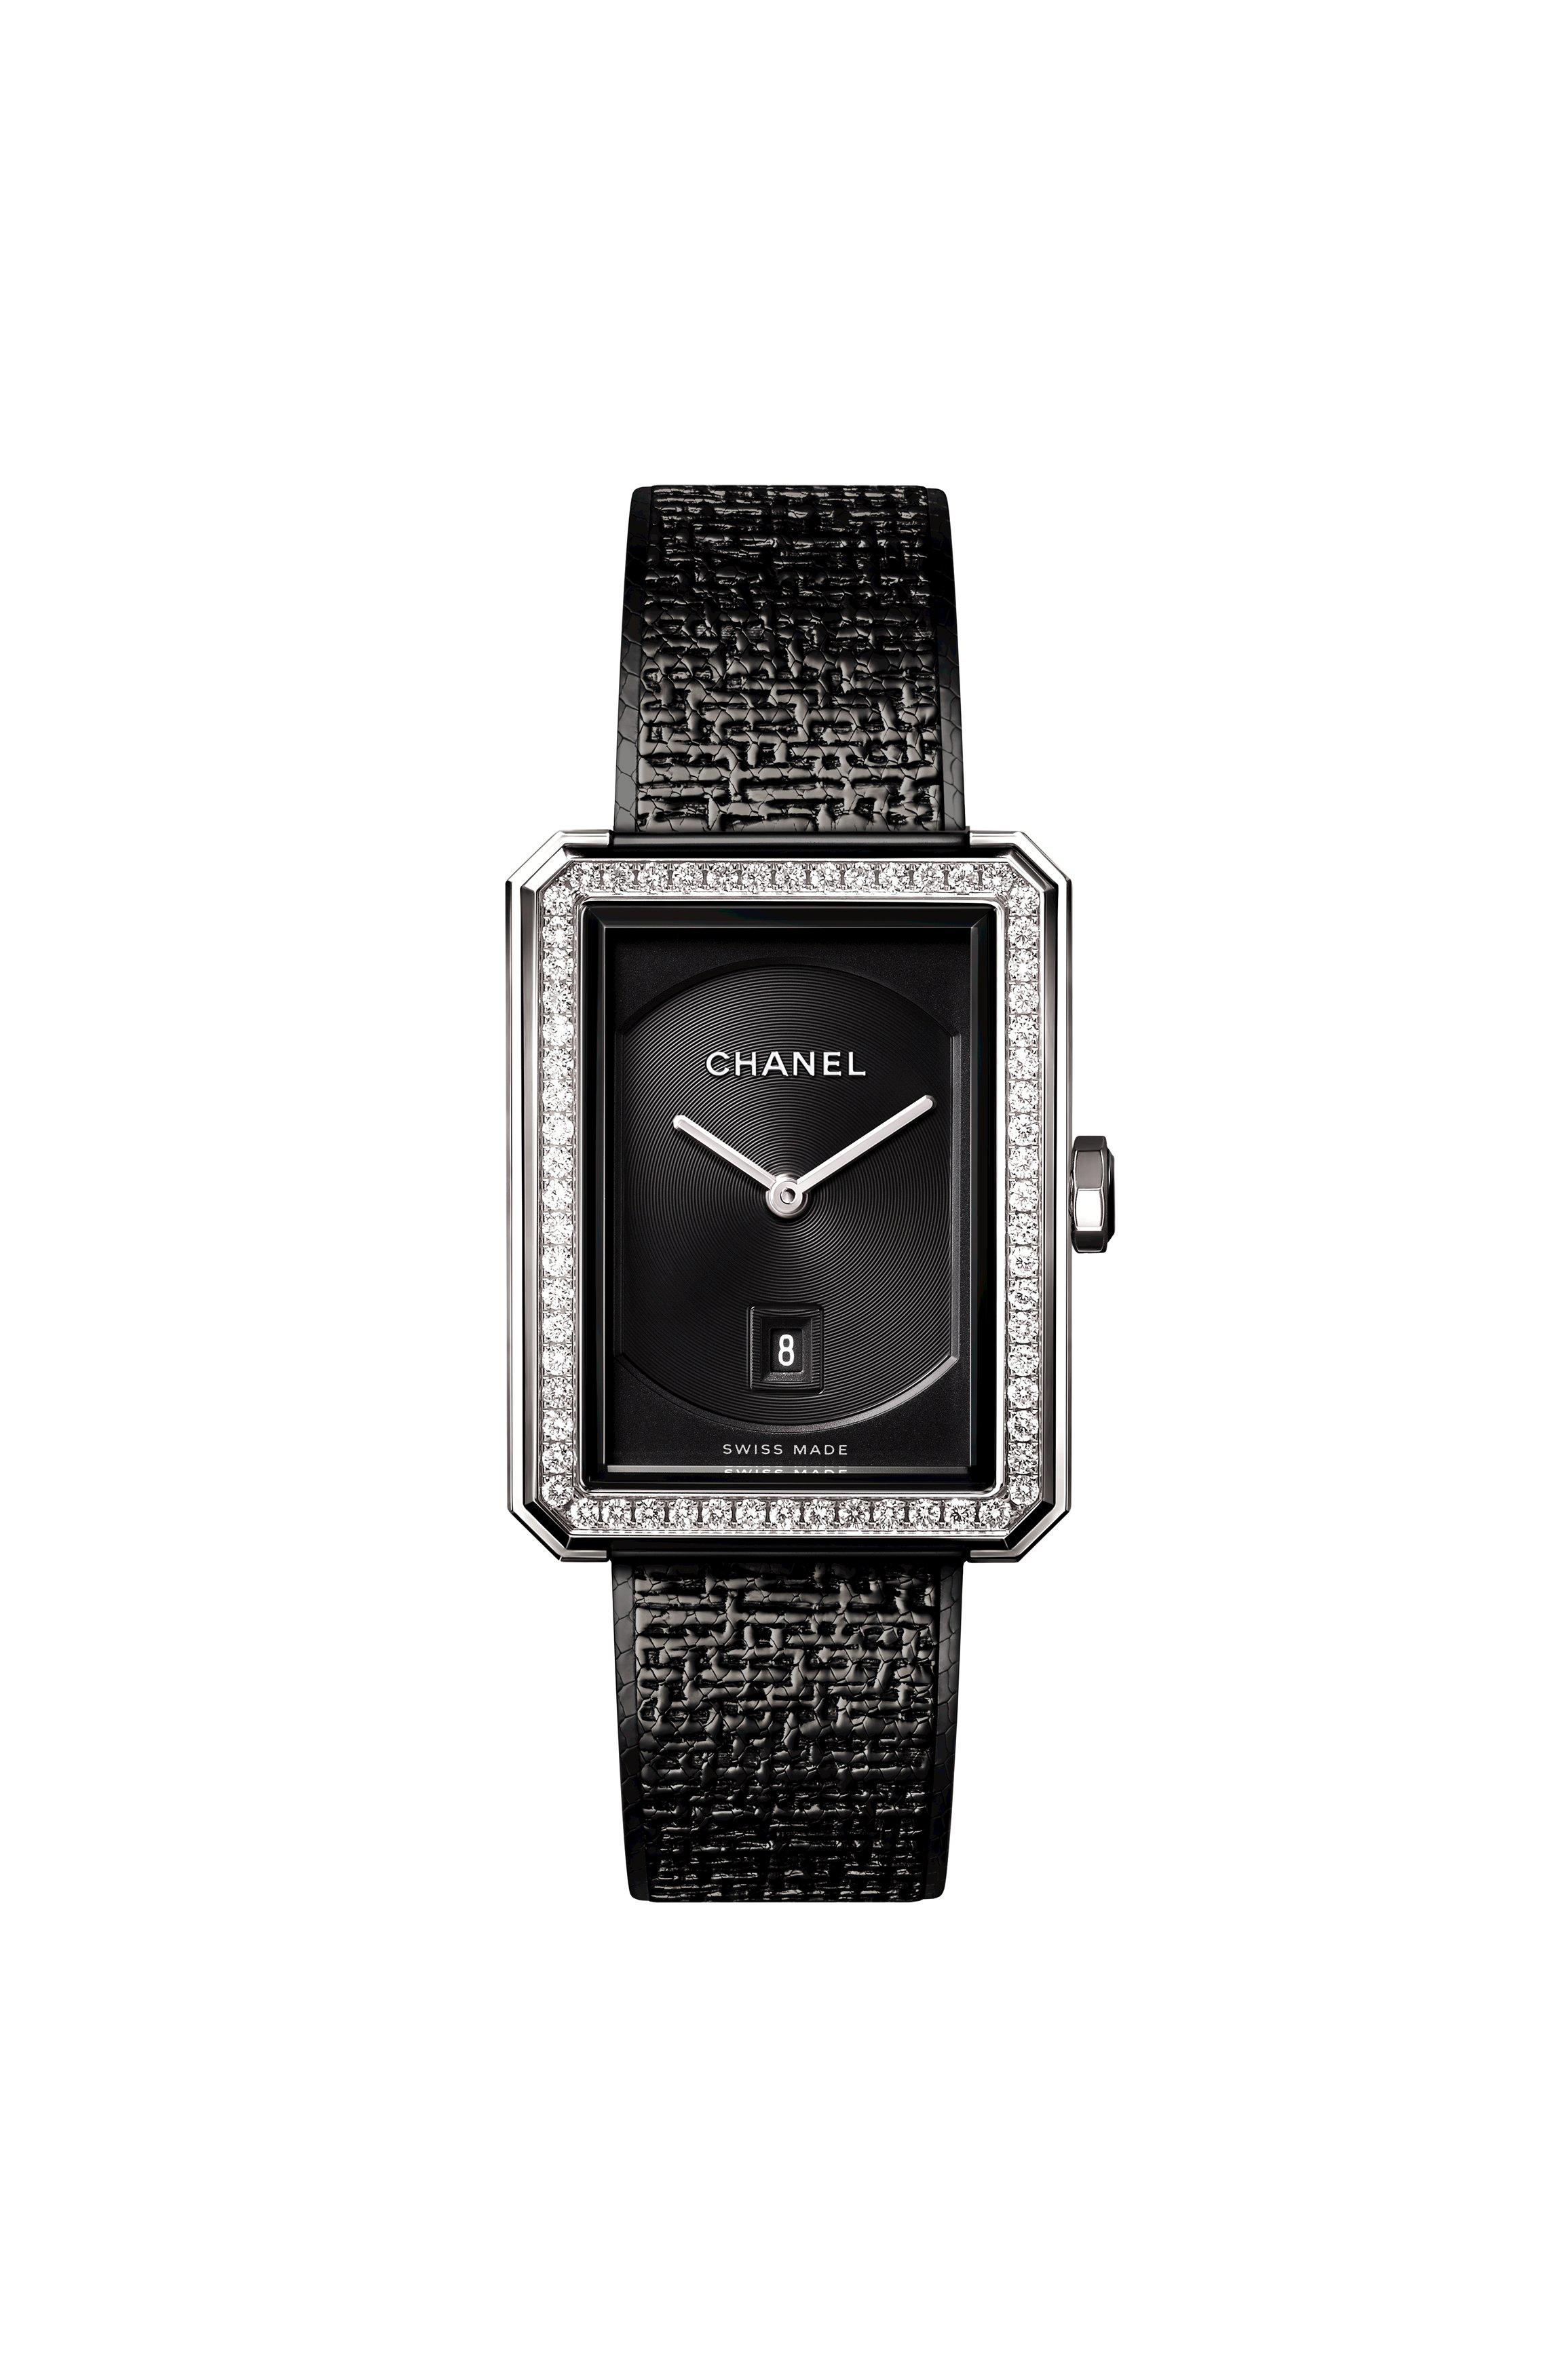 new product 871ac 1bf78 シャネルの時計「ボーイフレンド ツイード」から新作が登場